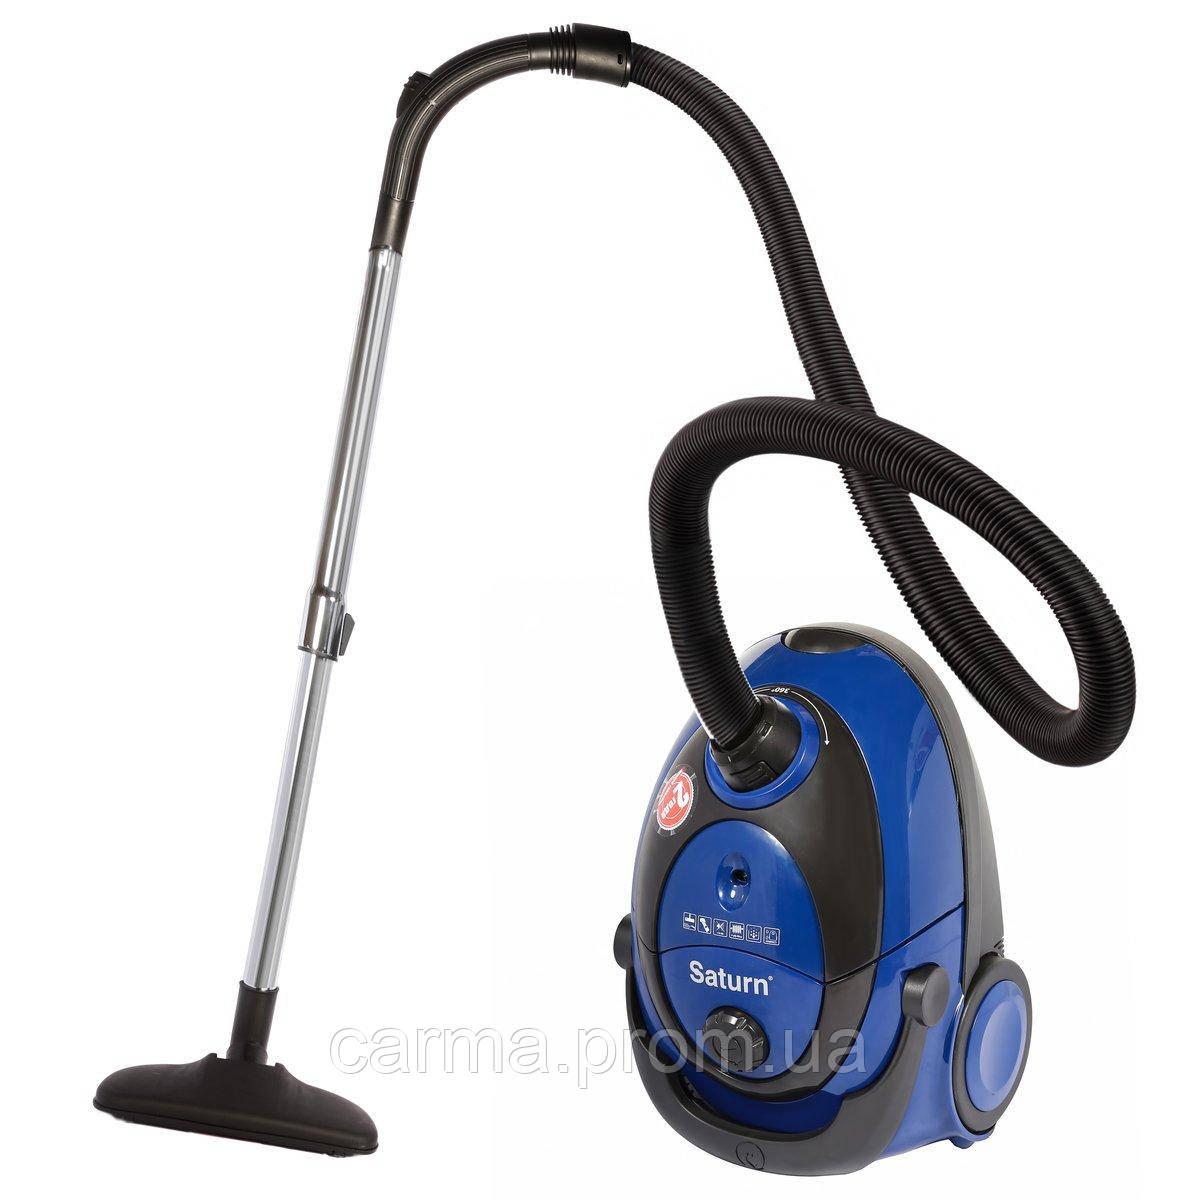 Пылесос для сухой уборки SATURN ST-VC0253 Синий